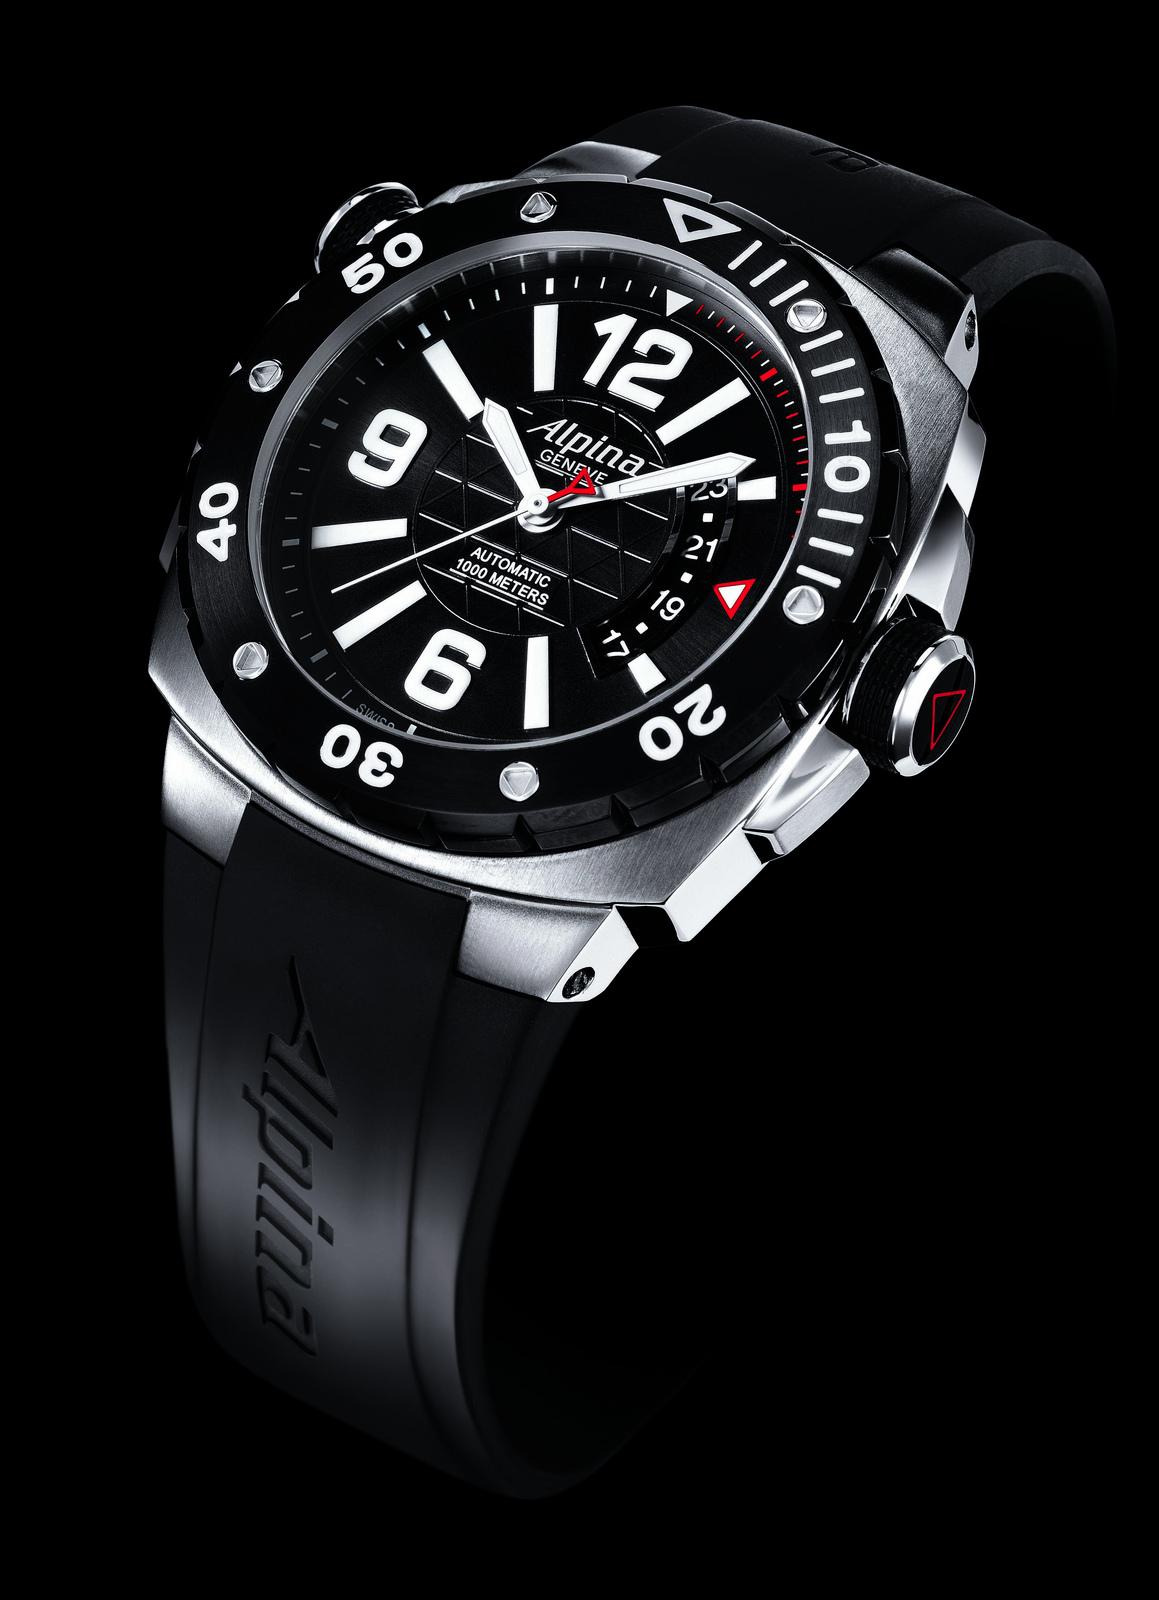 Random Photo Video Database Alpina Extreme Diver Watch - Alpina watch price